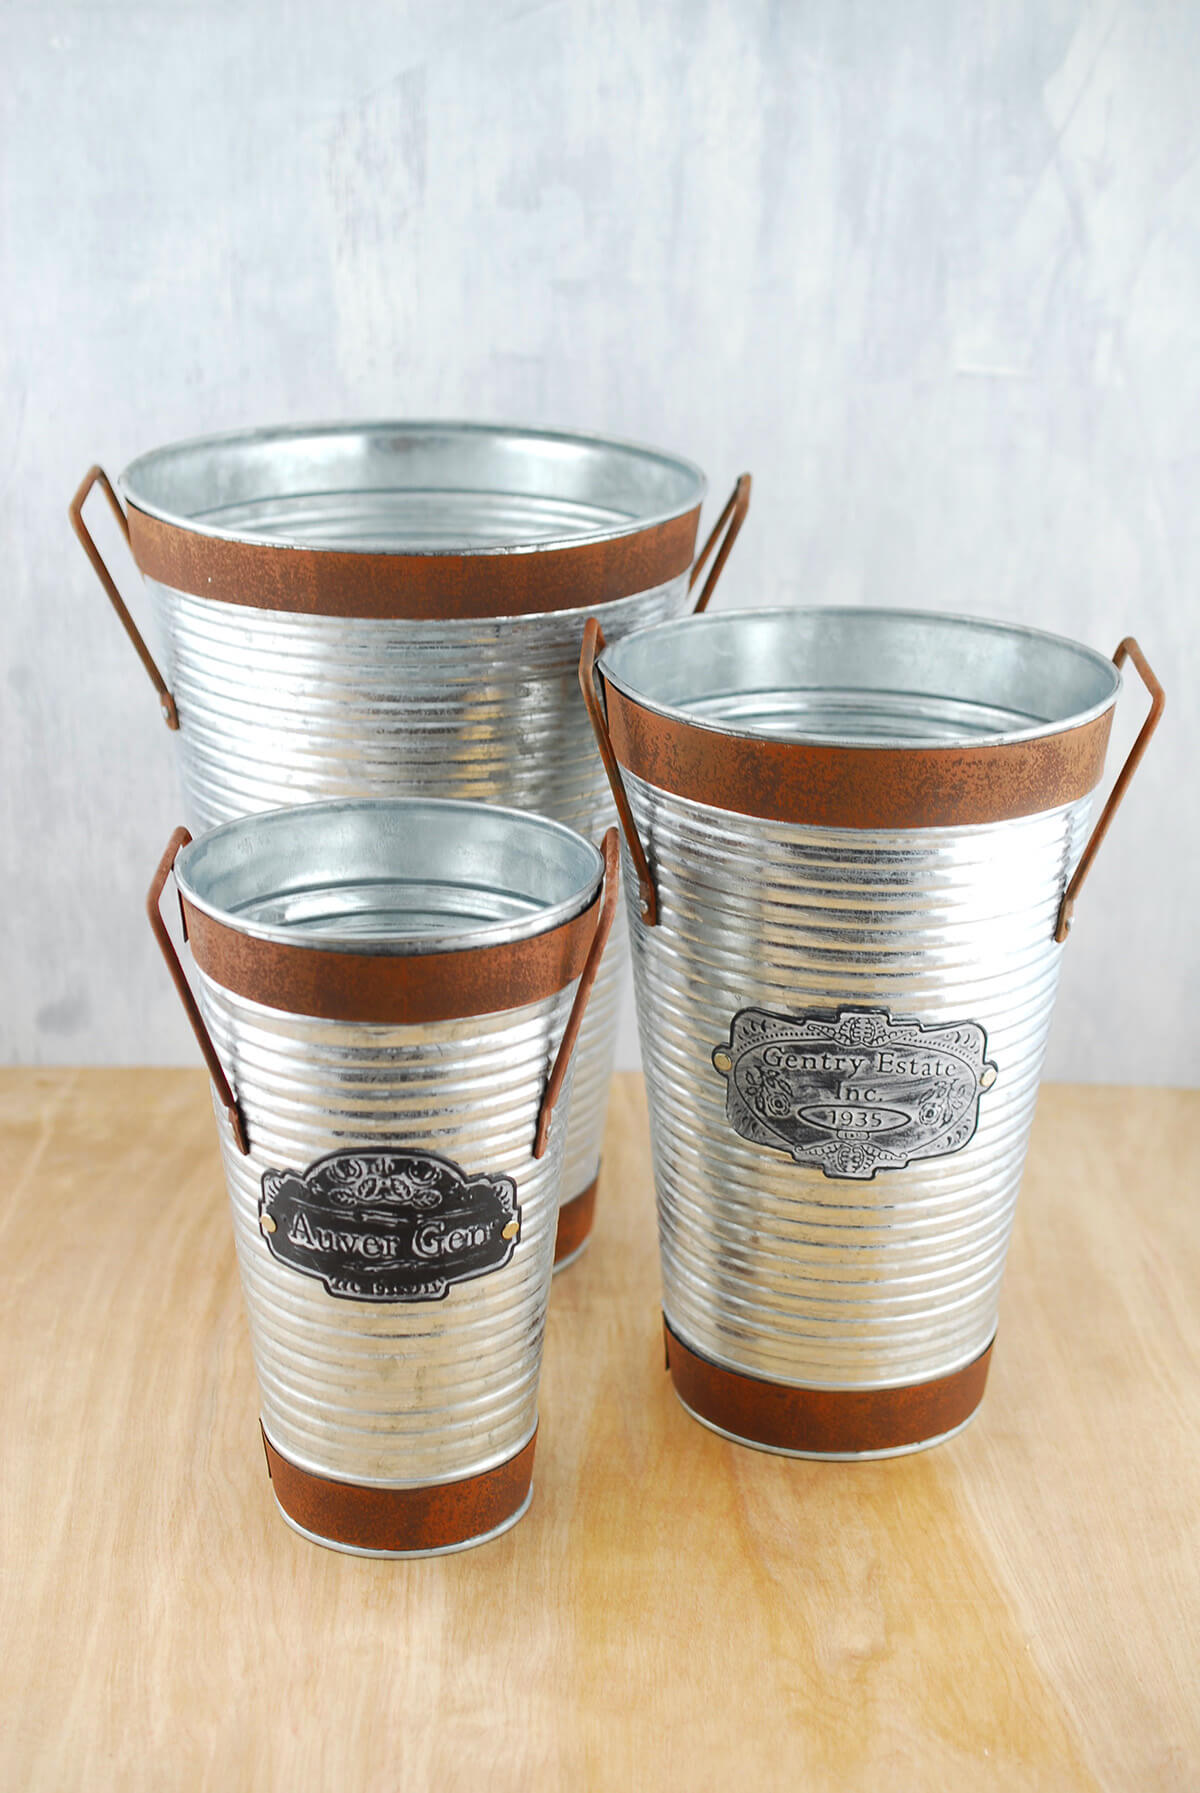 Galvanized metal bucket for Galvanized well bucket